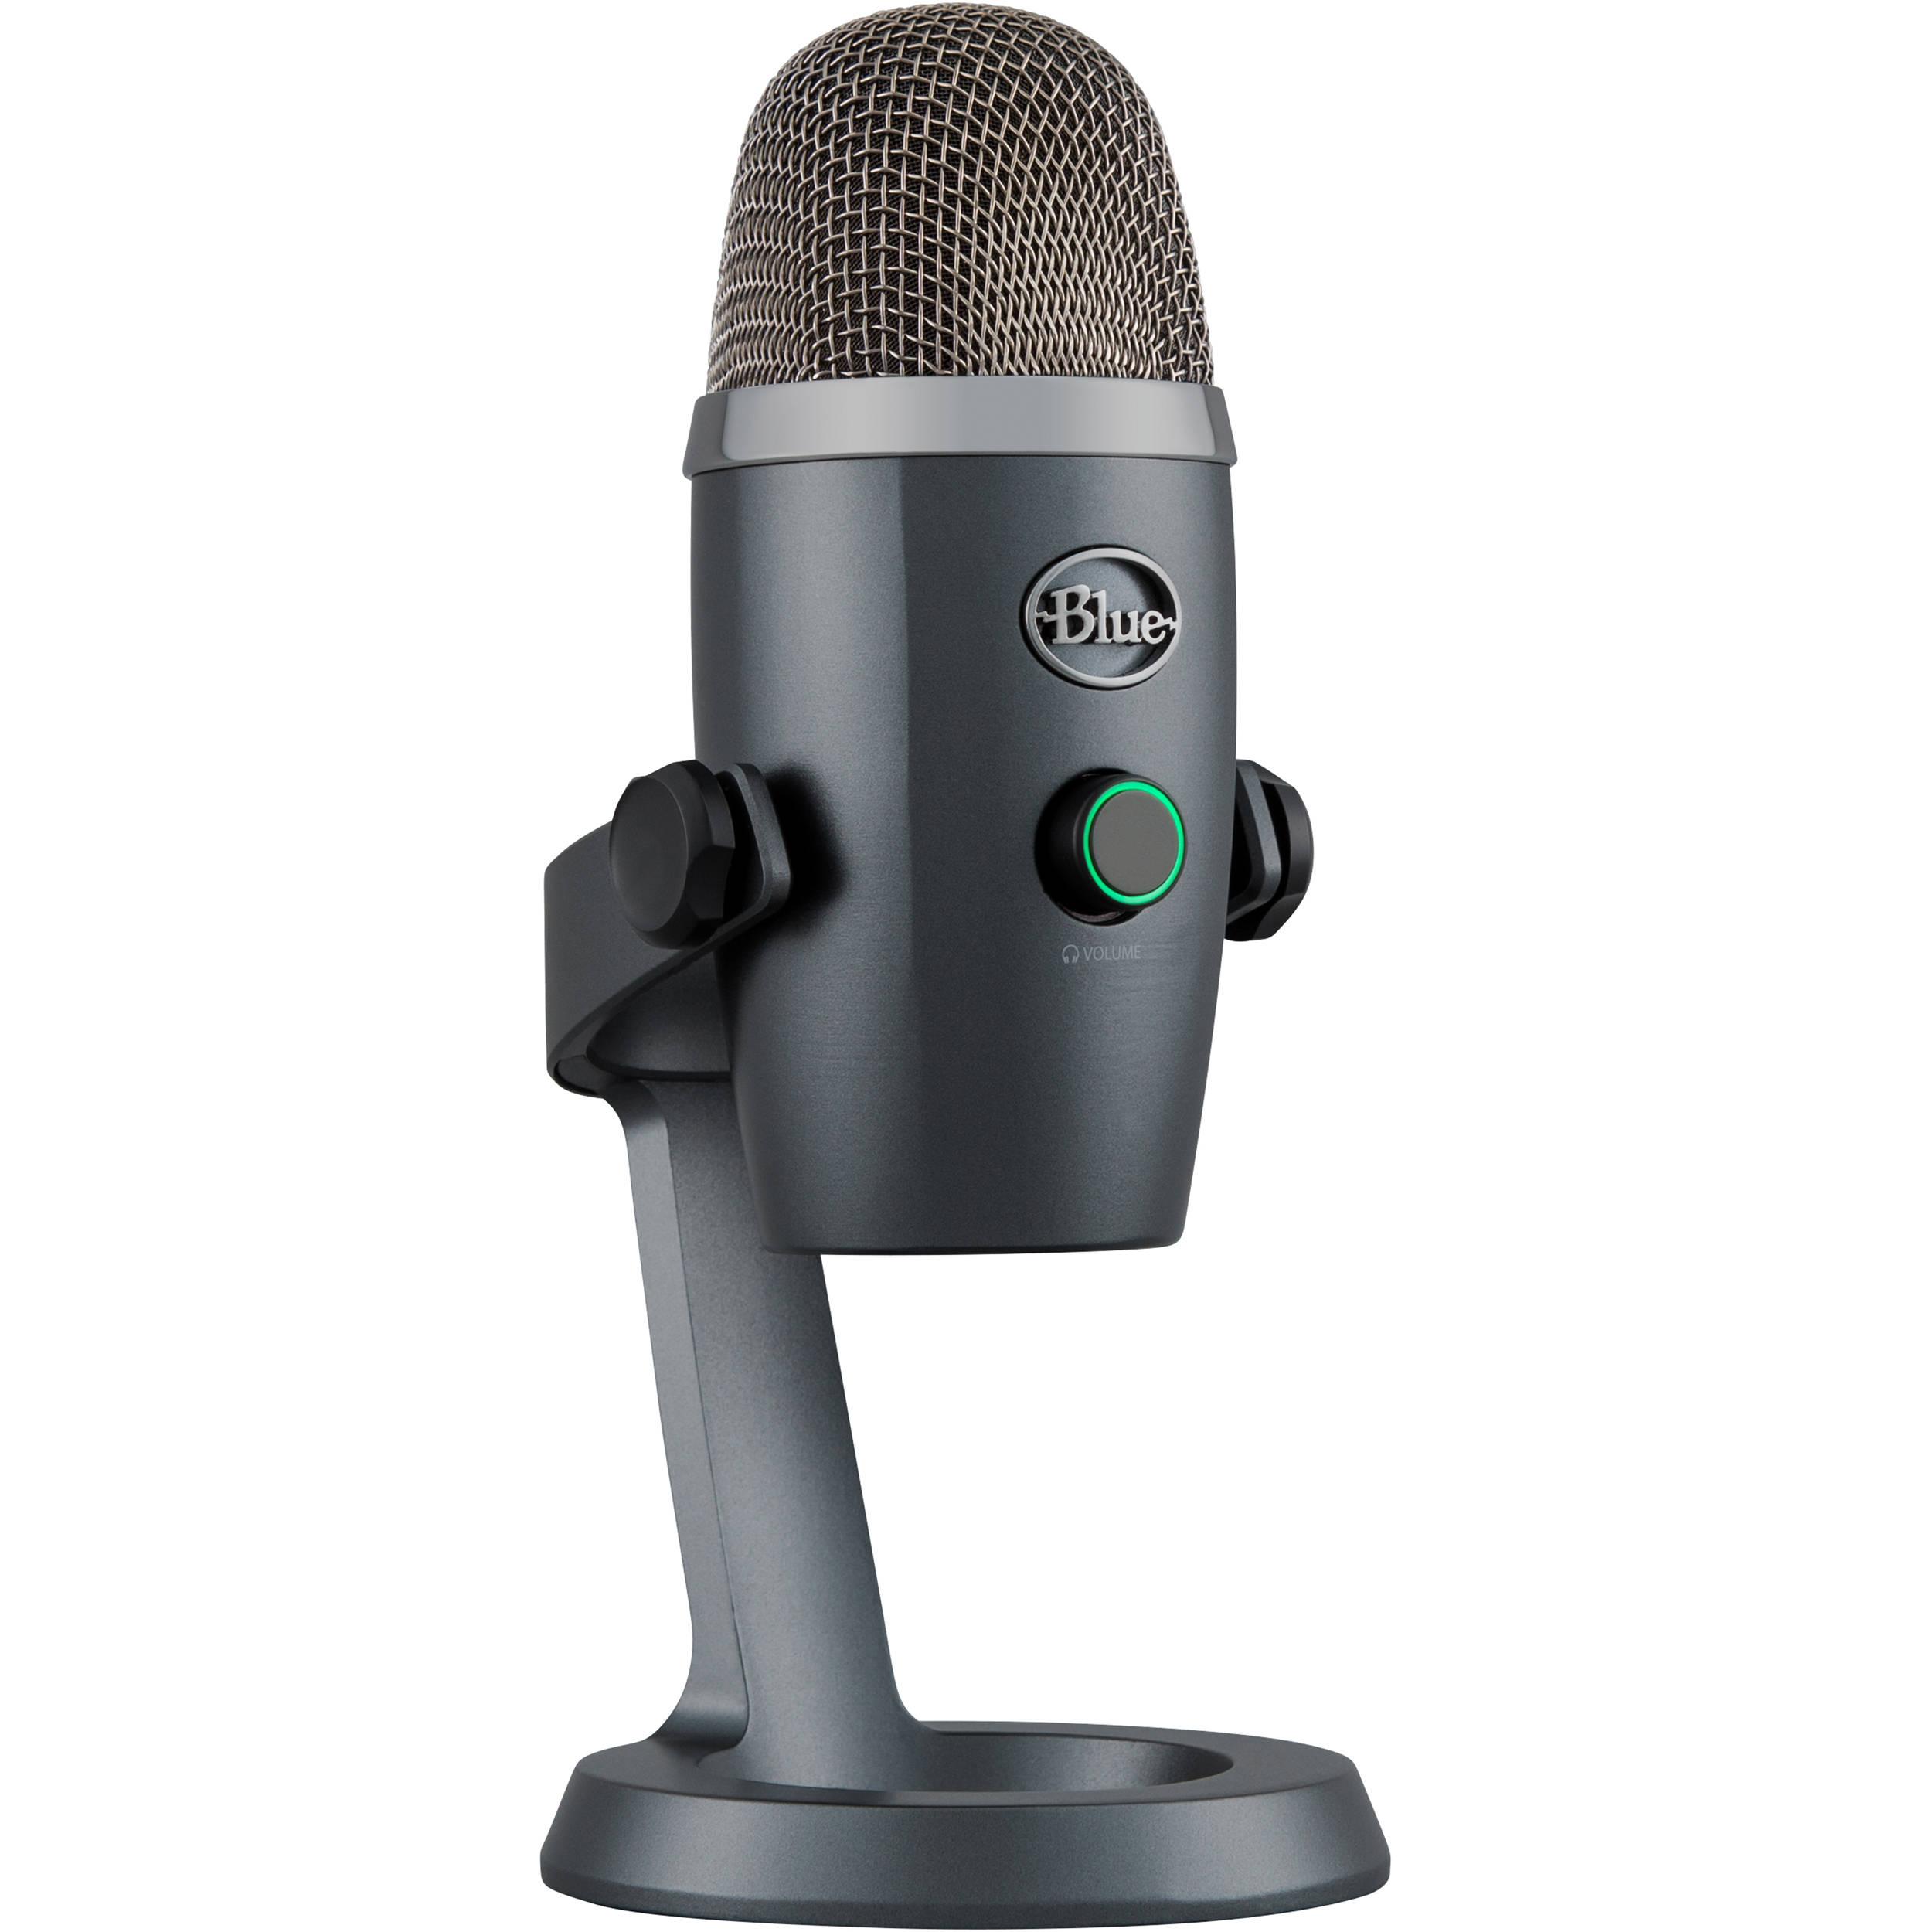 Blue Yeti USB Microphone Nano